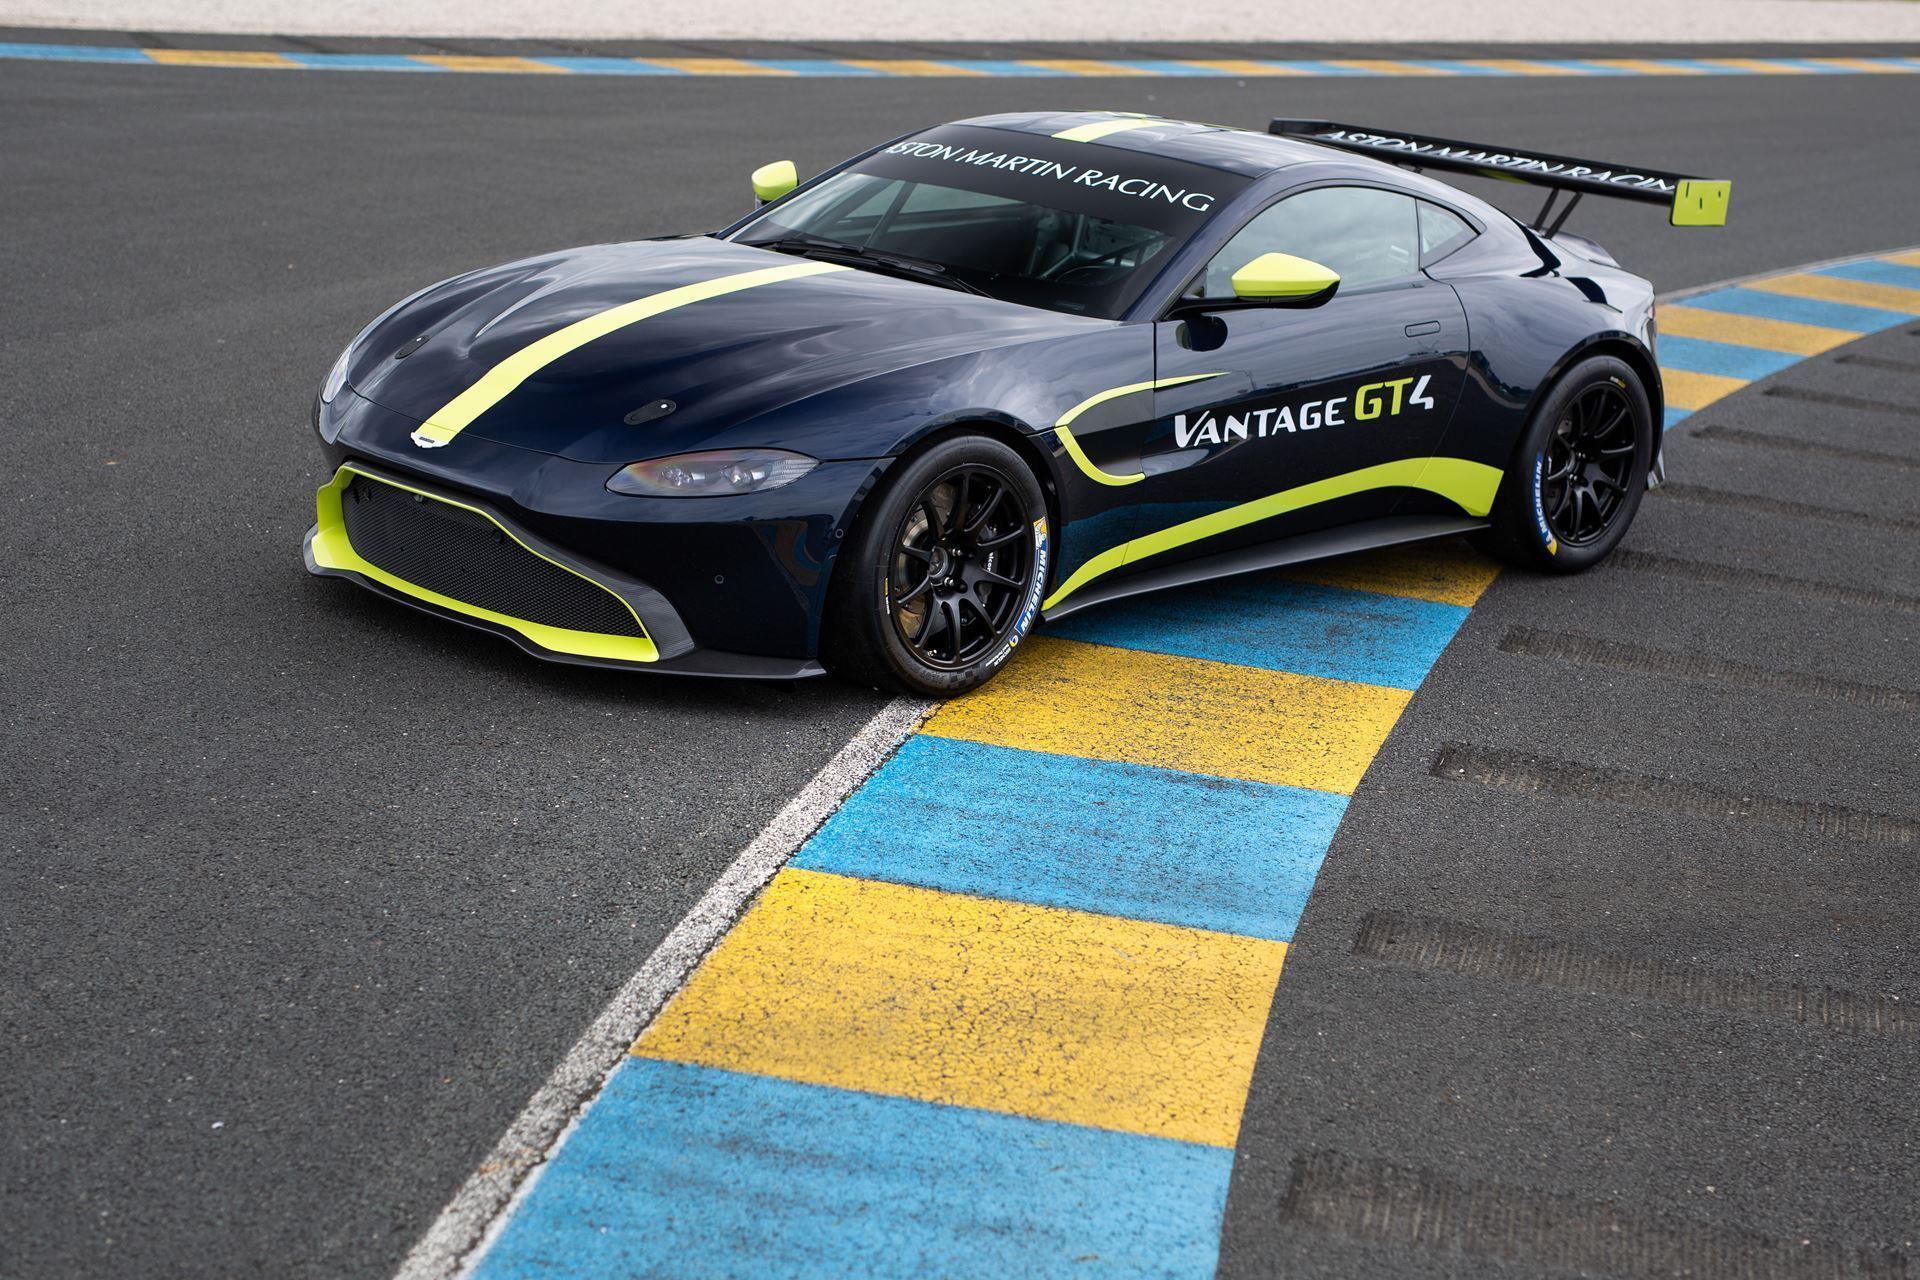 Aston Martin Vantage GT News And Information Research And - 2018 aston martin vantage